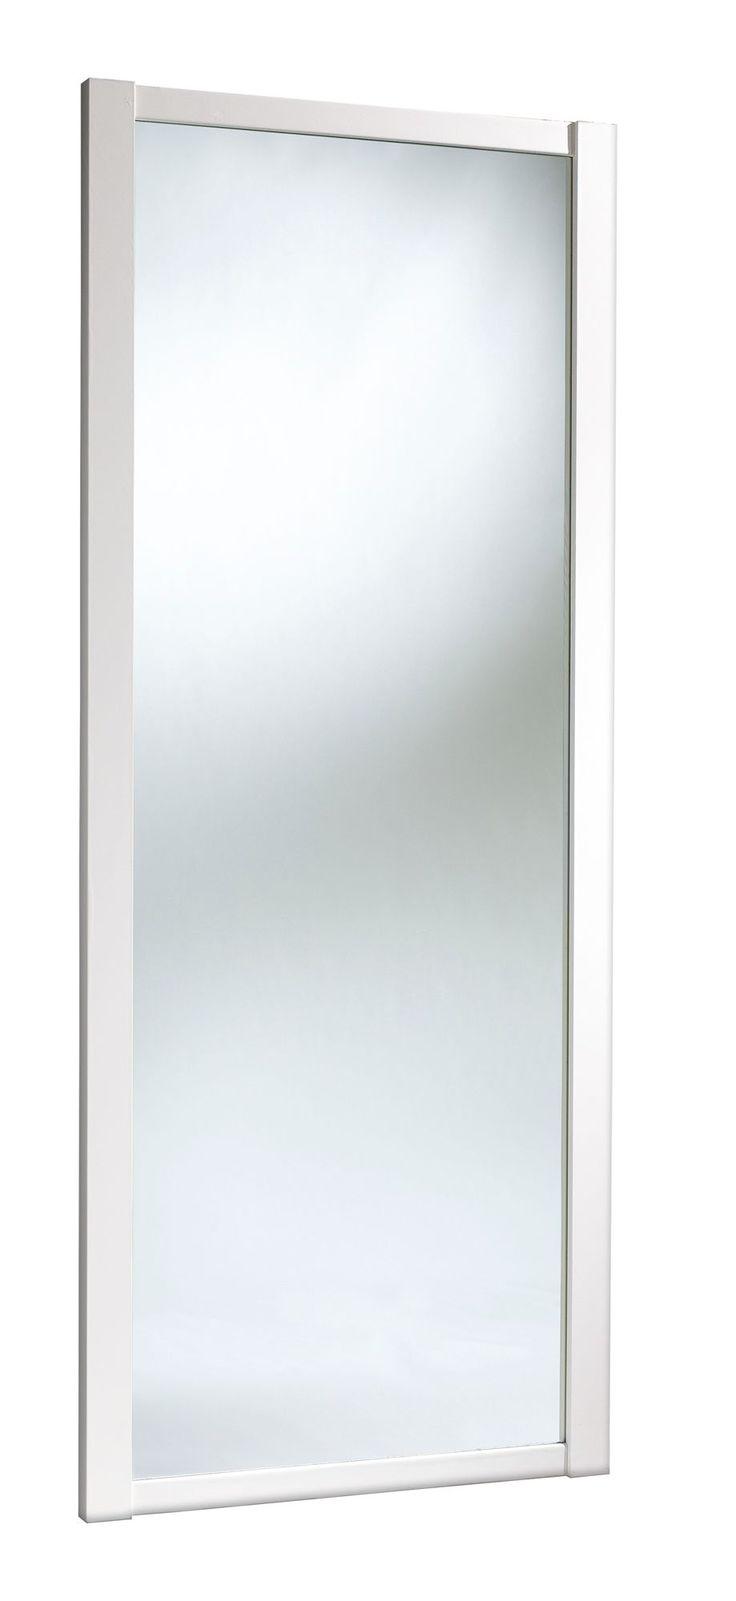 Traditional Full Length Mirror White Sliding Wardrobe Door (H)2.22 M (W)610 mm   Rooms   DIY at B&Q